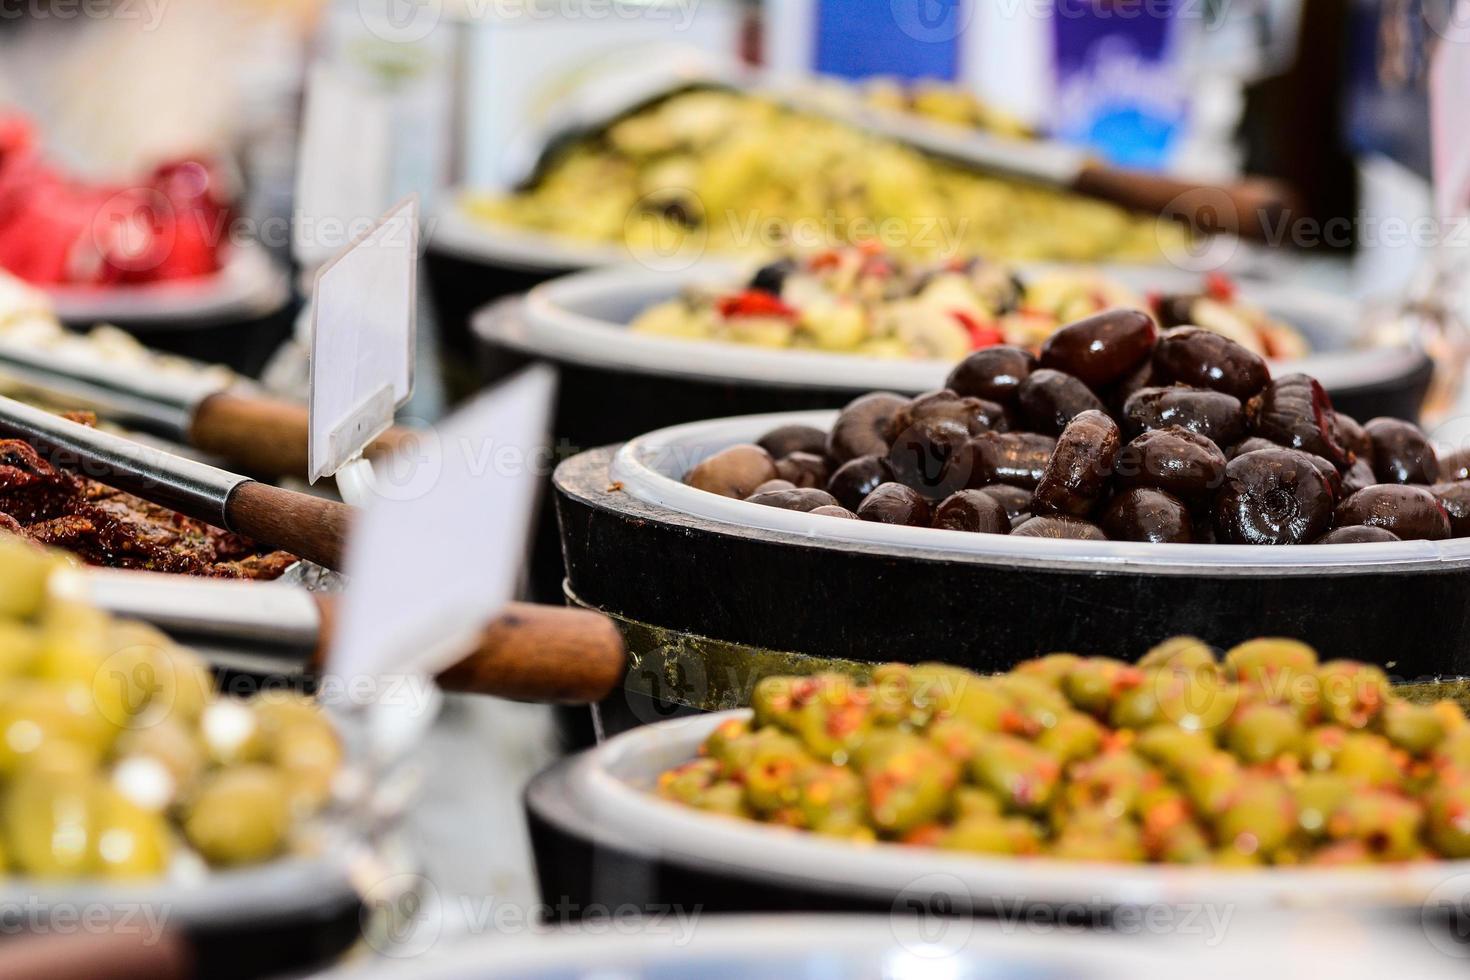 italienische Tabelle des Essens foto